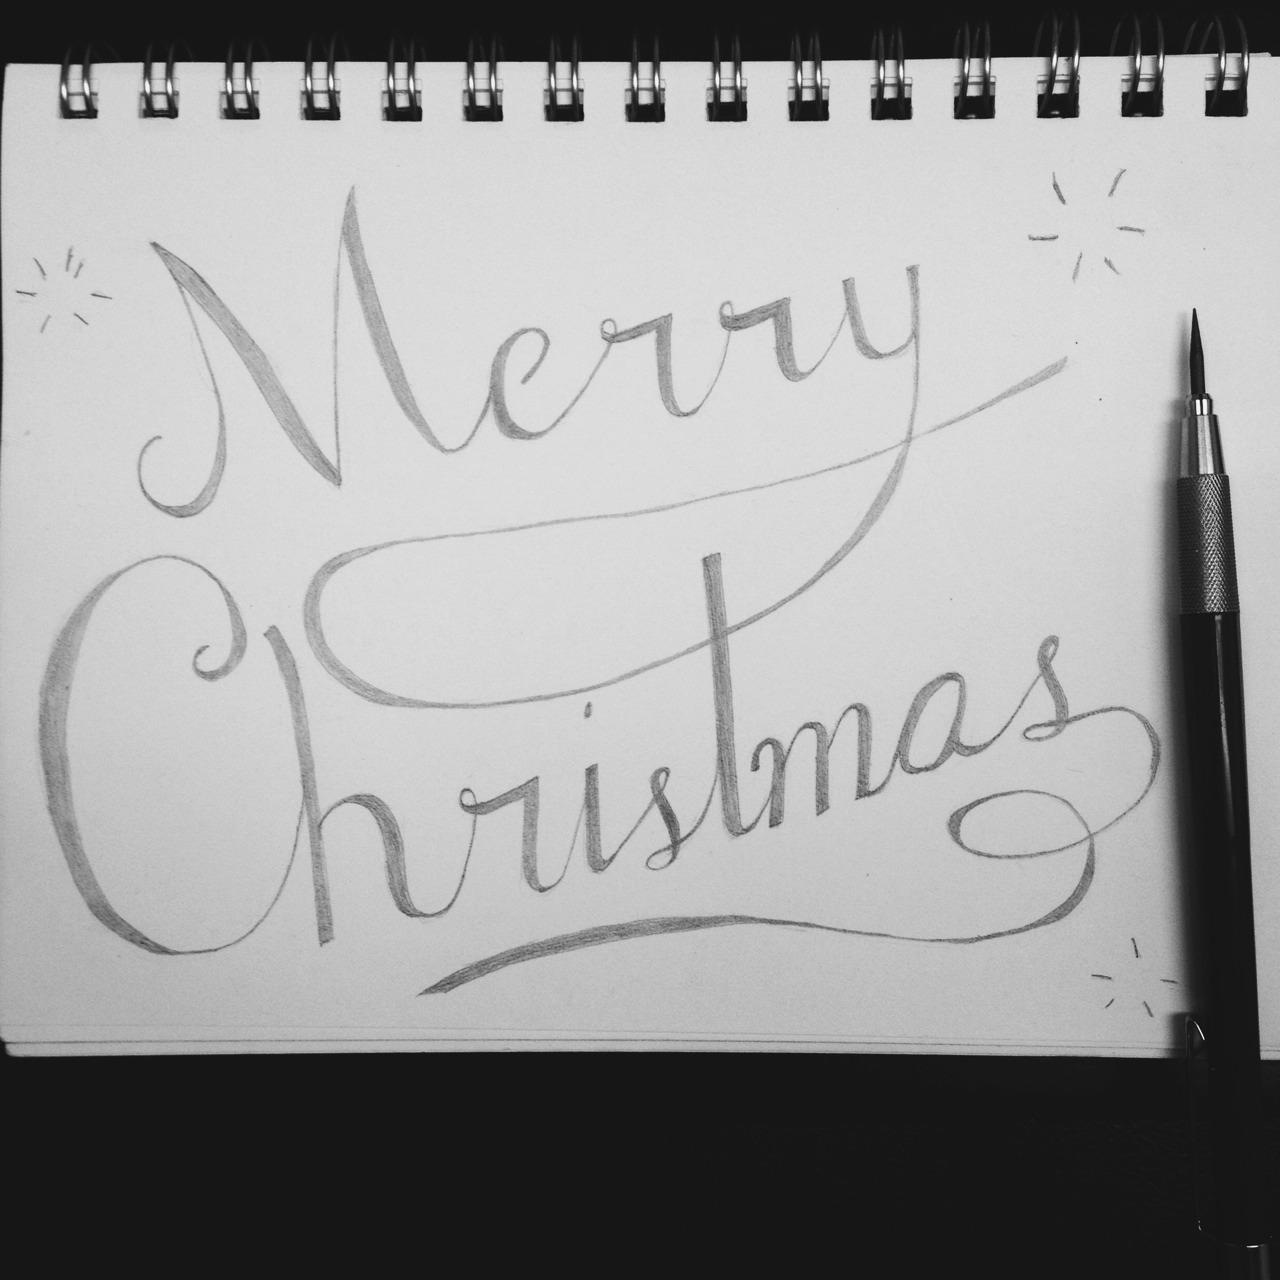 Christmas doodling #lettering #handdrawn